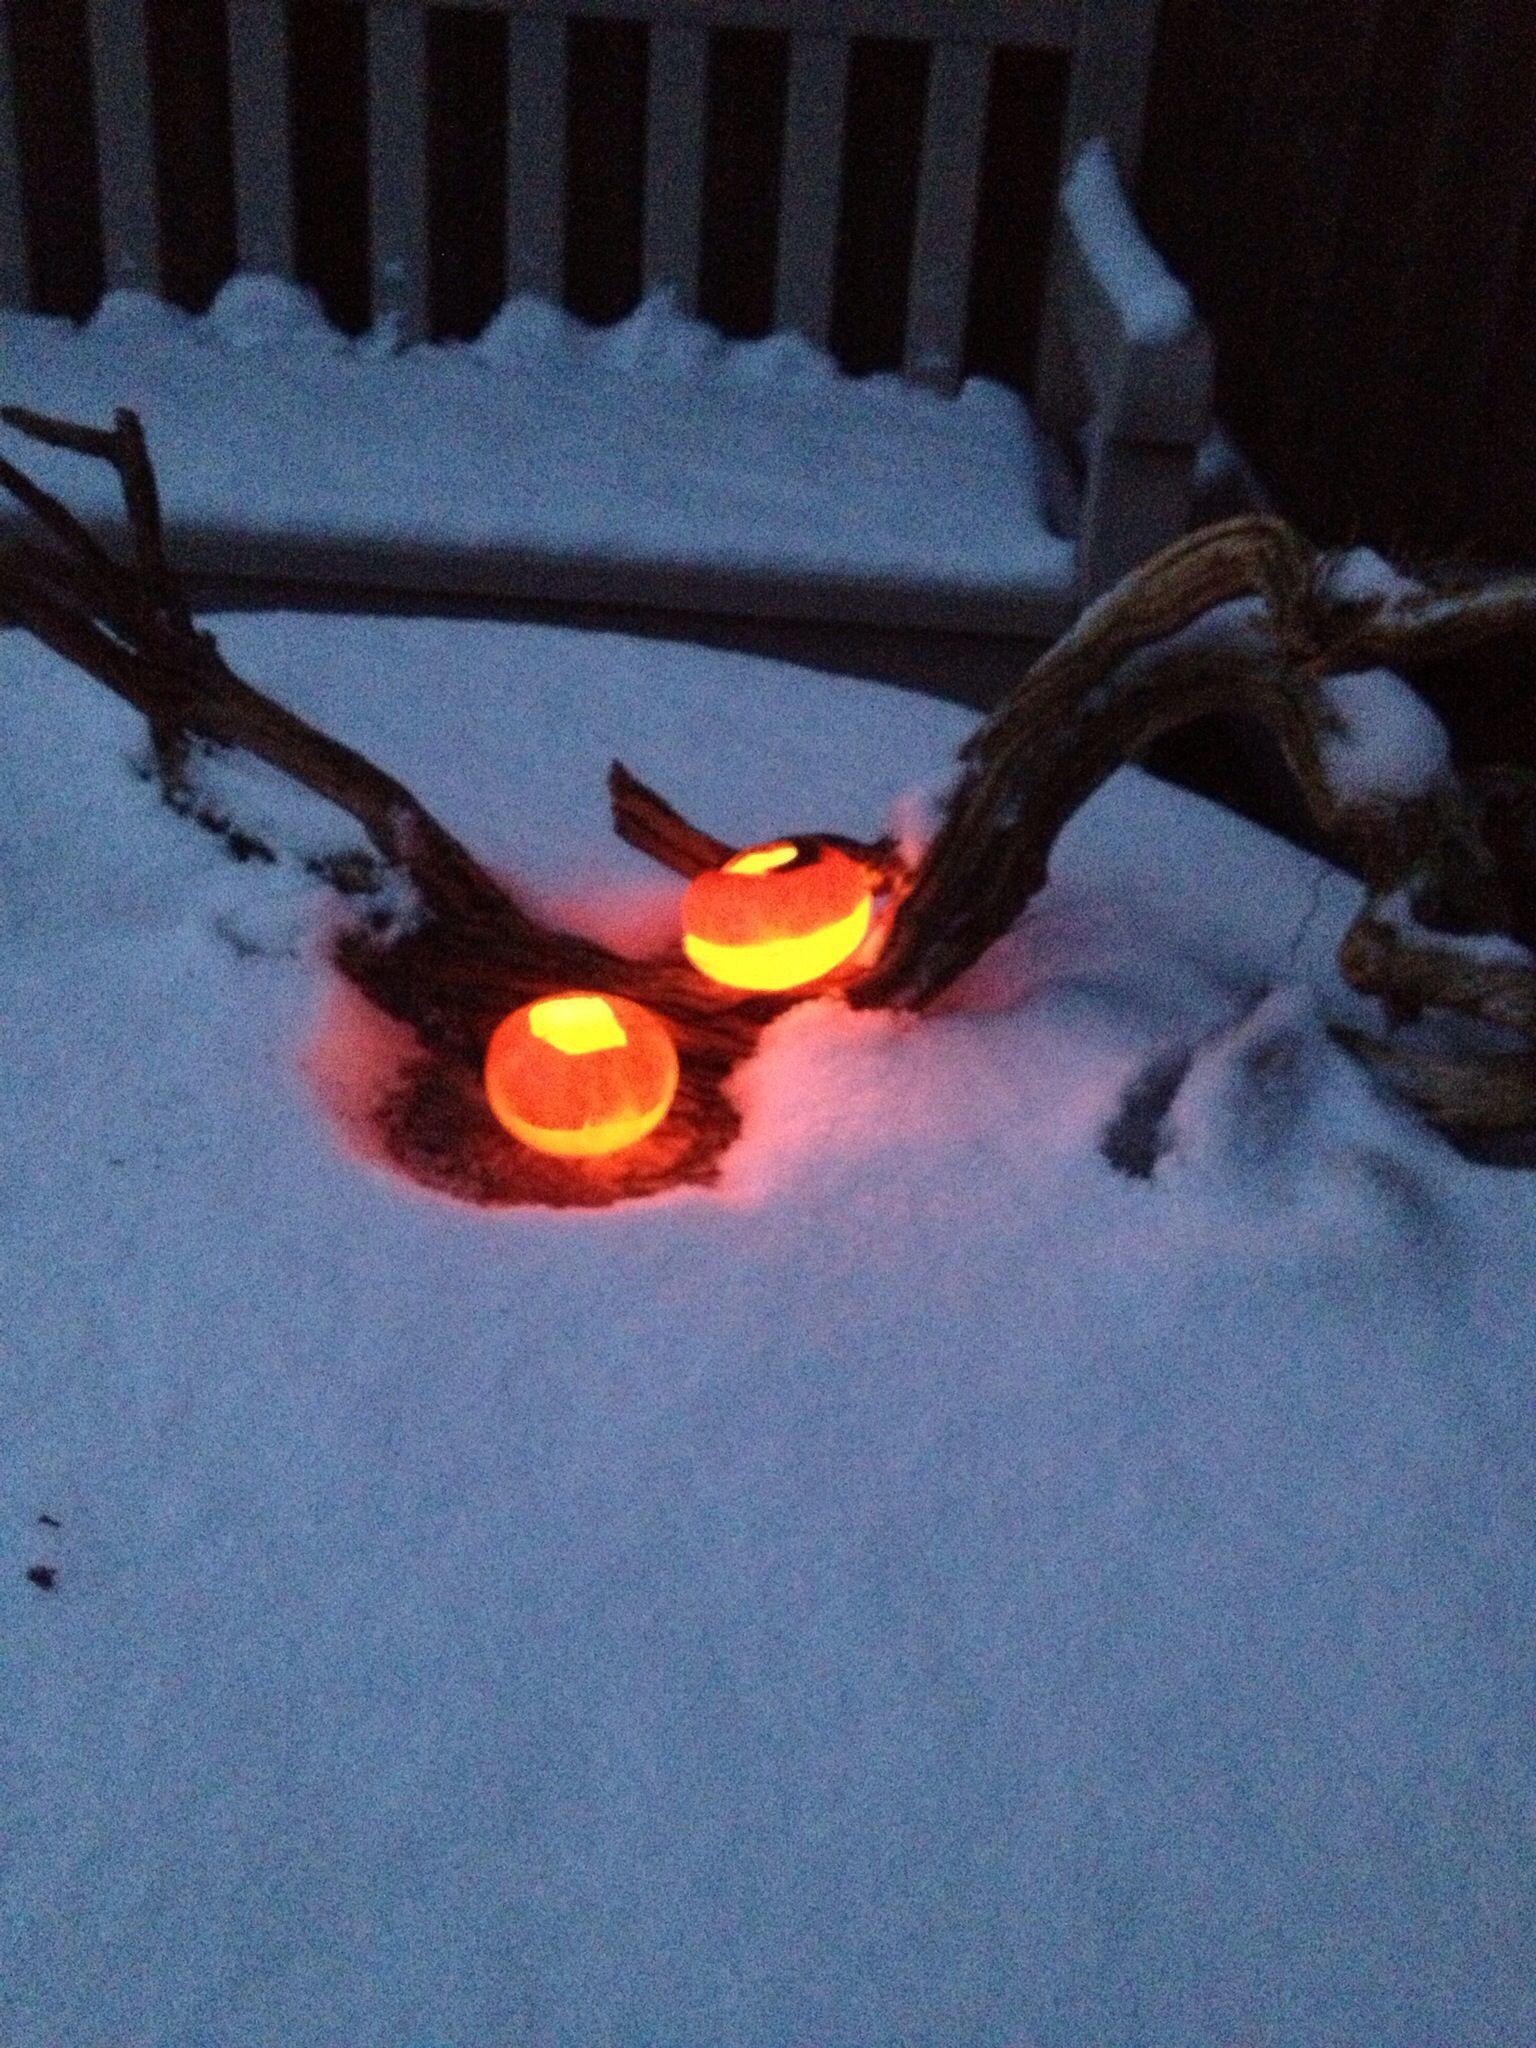 How to Make Oil Lights in a Mandarin  Peel